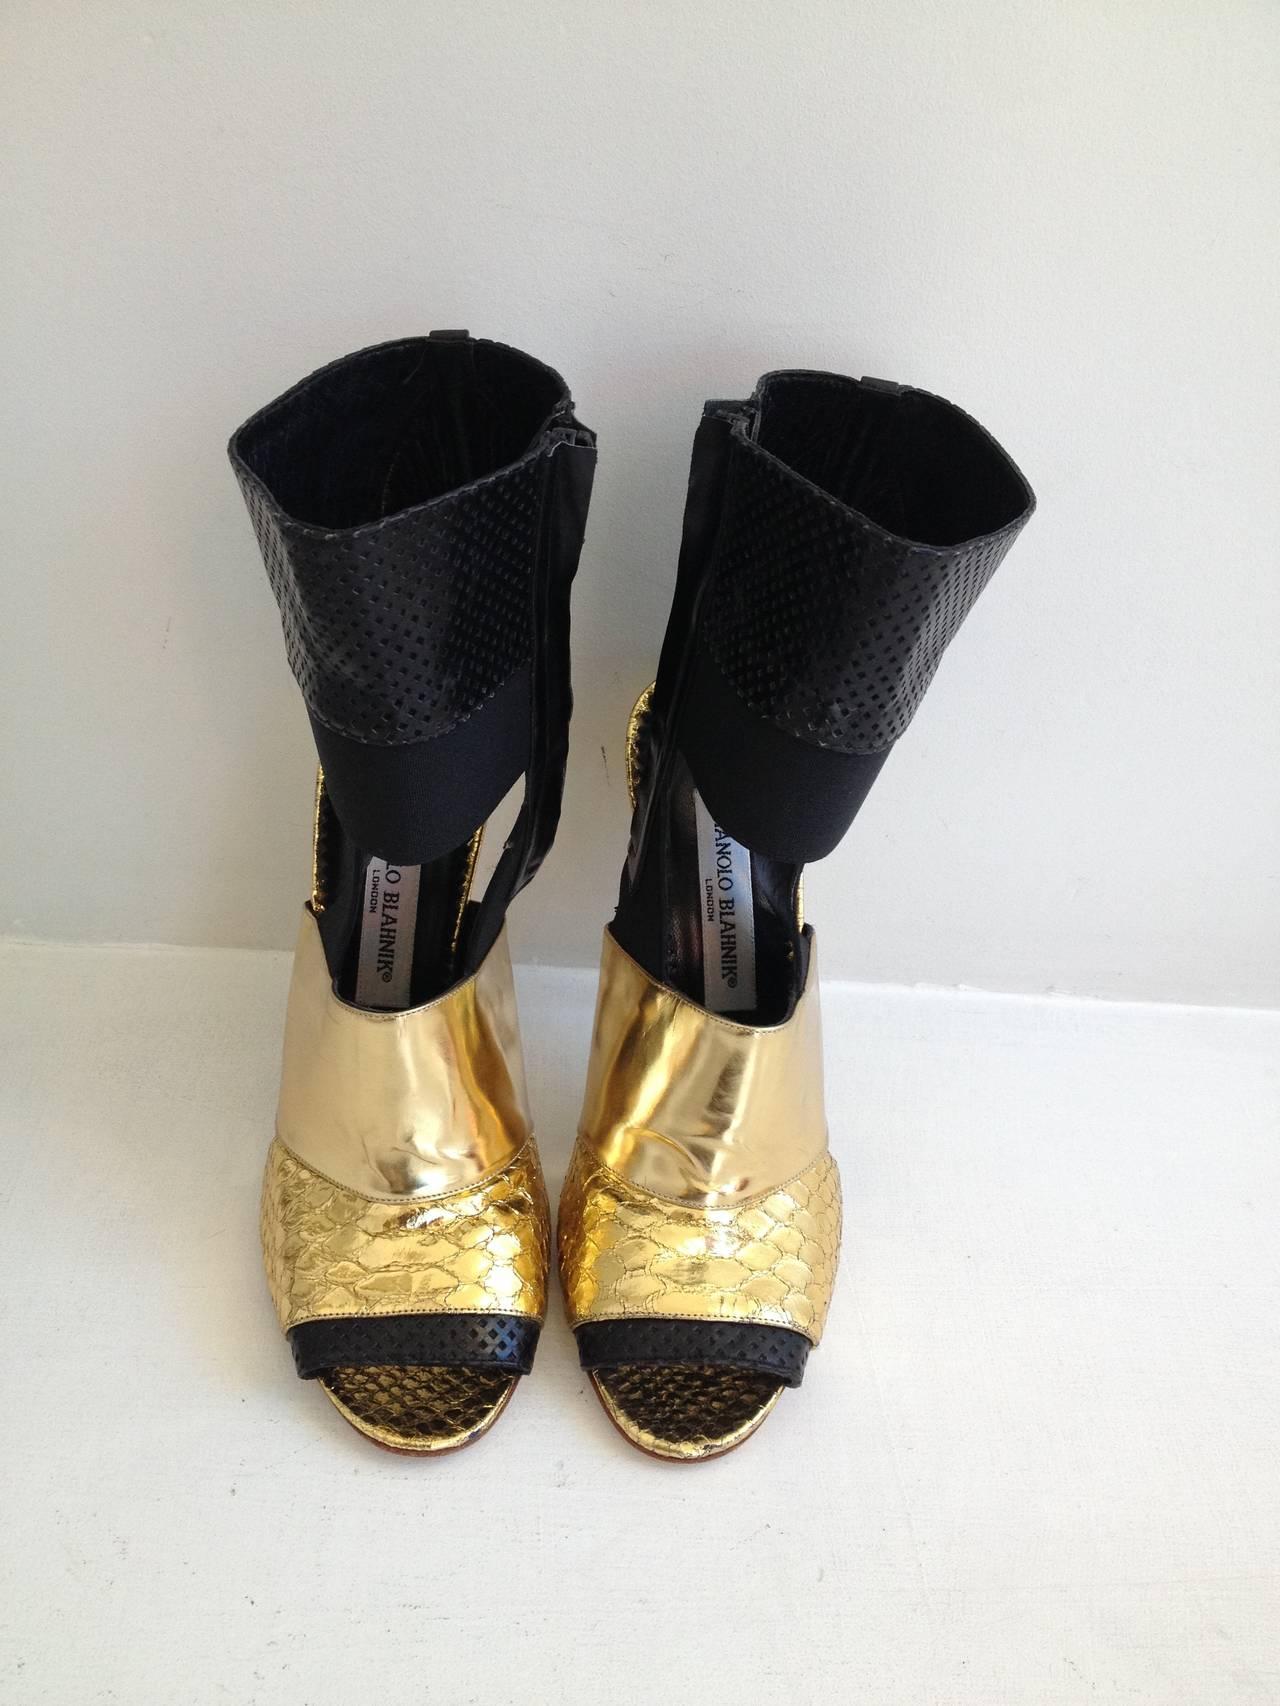 Manolo Blahnik Black and Gold Metallic Heels 2